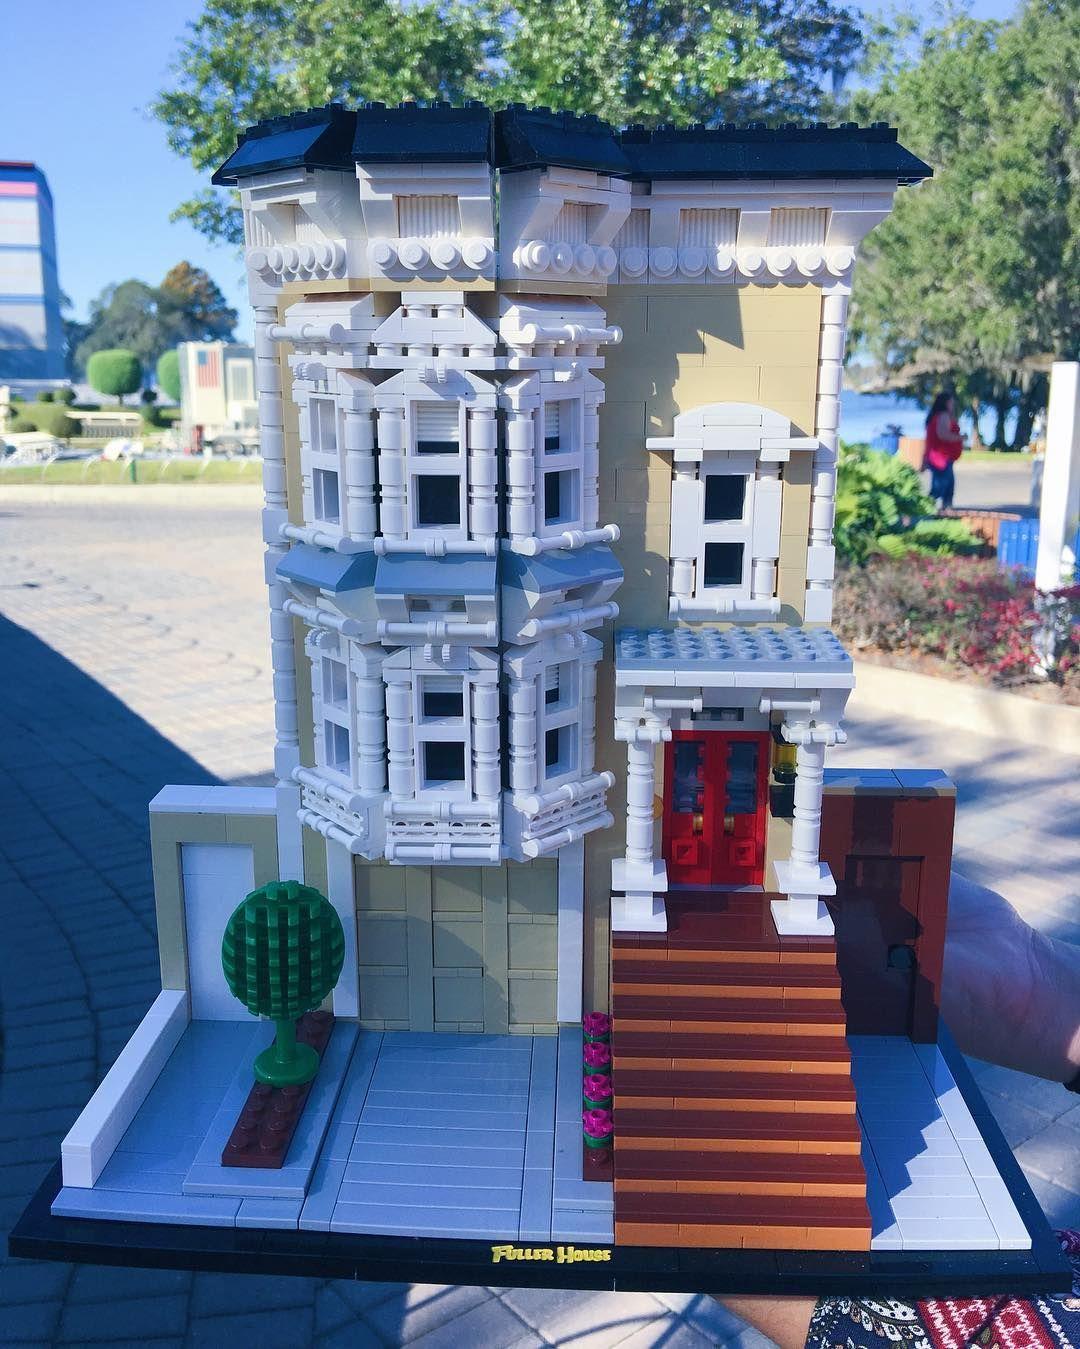 Lego Full House Lego Fuller House Full House House Full House Fuller House